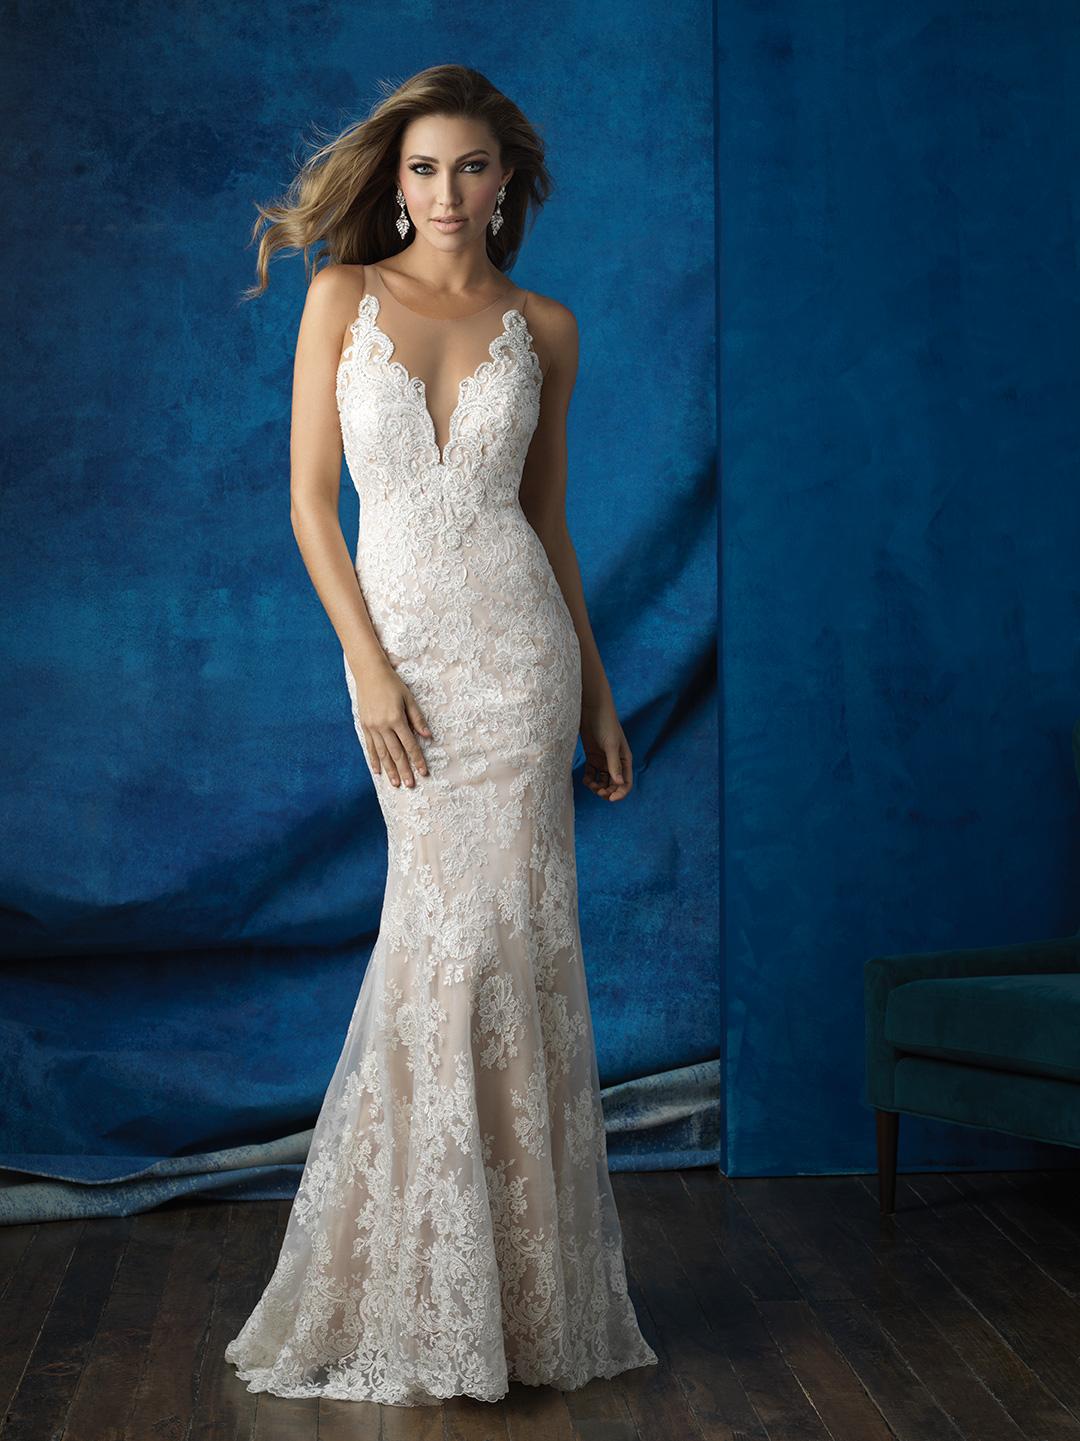 Allure wedding dress p930-055a